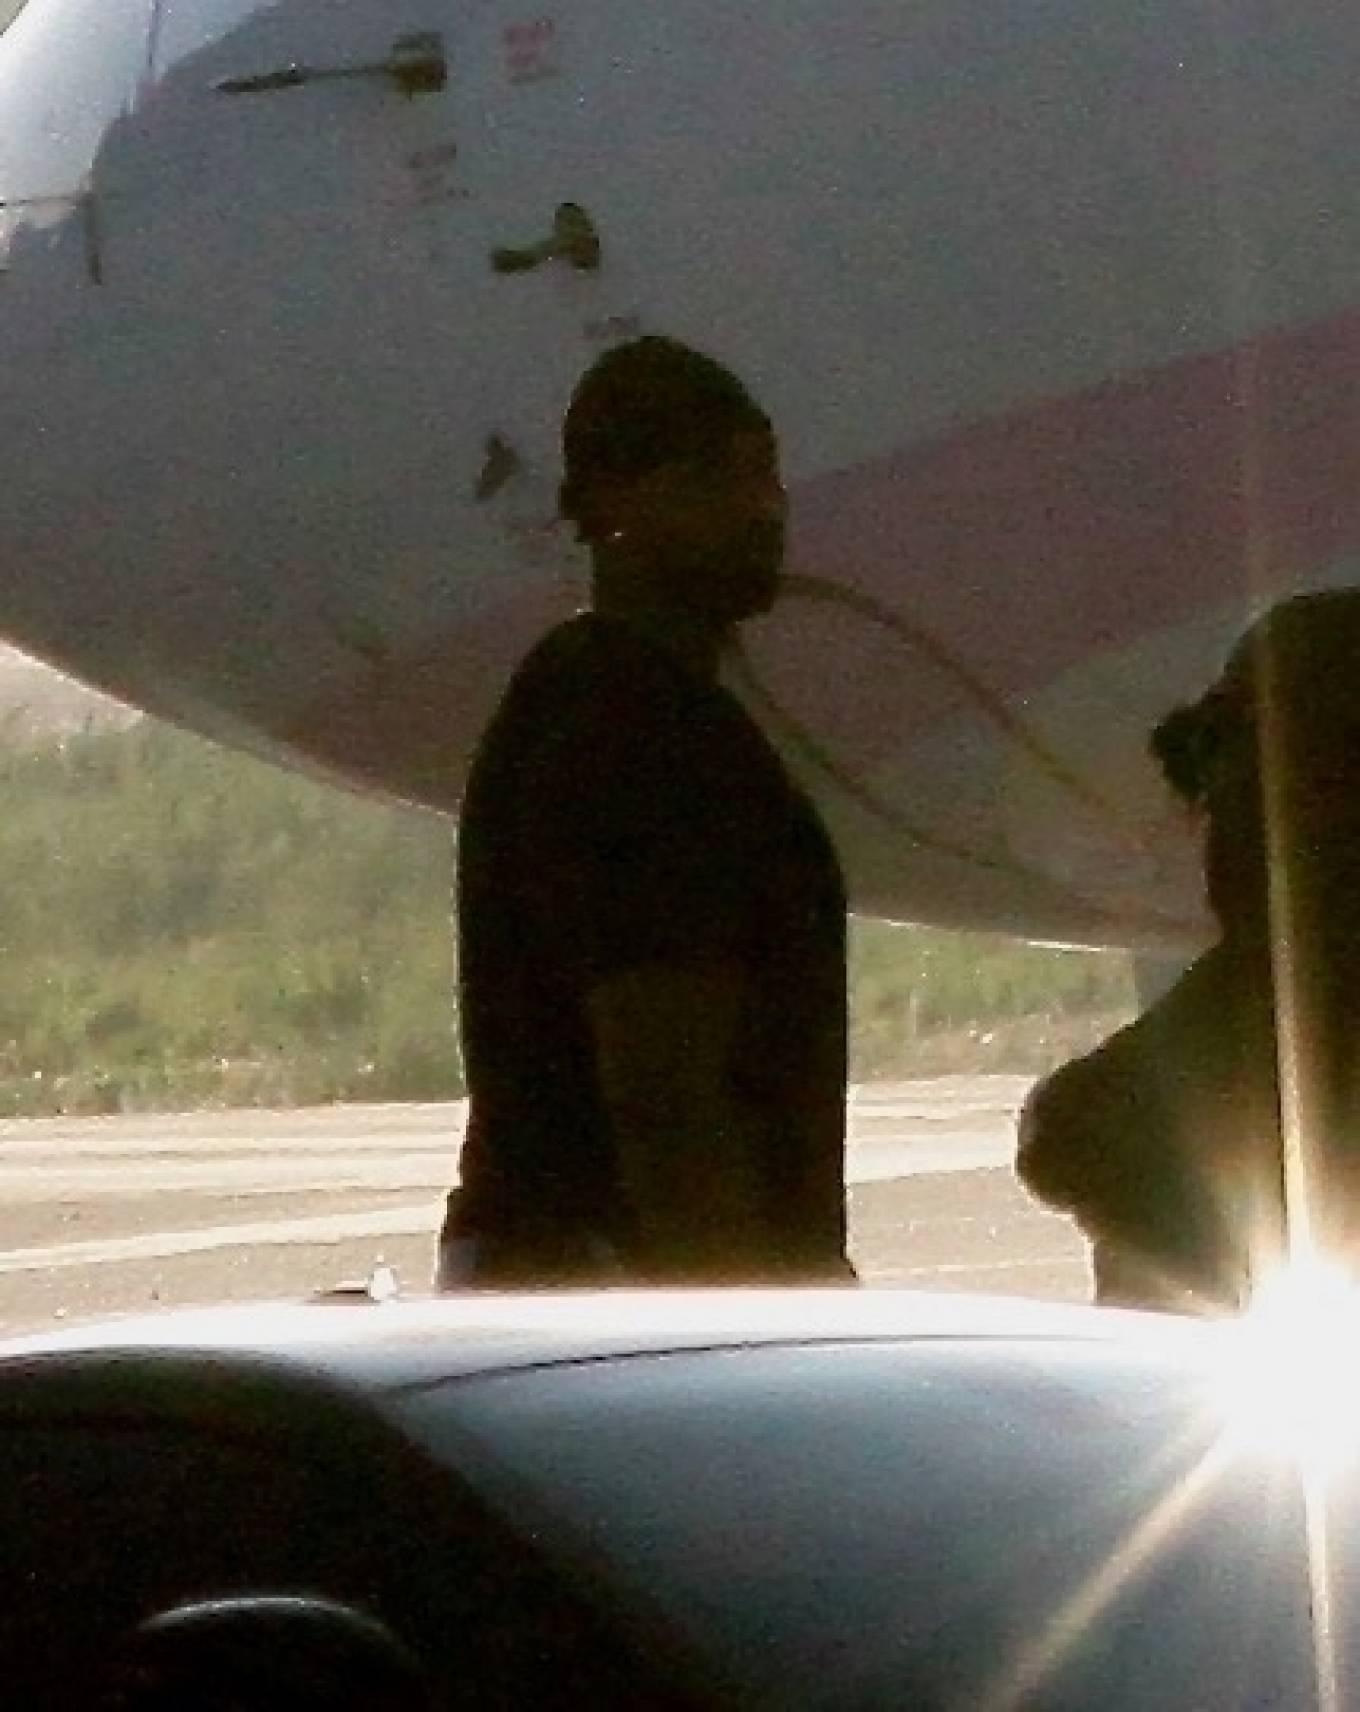 Khloe Kardashian 2020 : Khloe Kardashian and Kourtney Kardashian – Pictured boarding Kylie Jenners private jet in Van Nuys-22